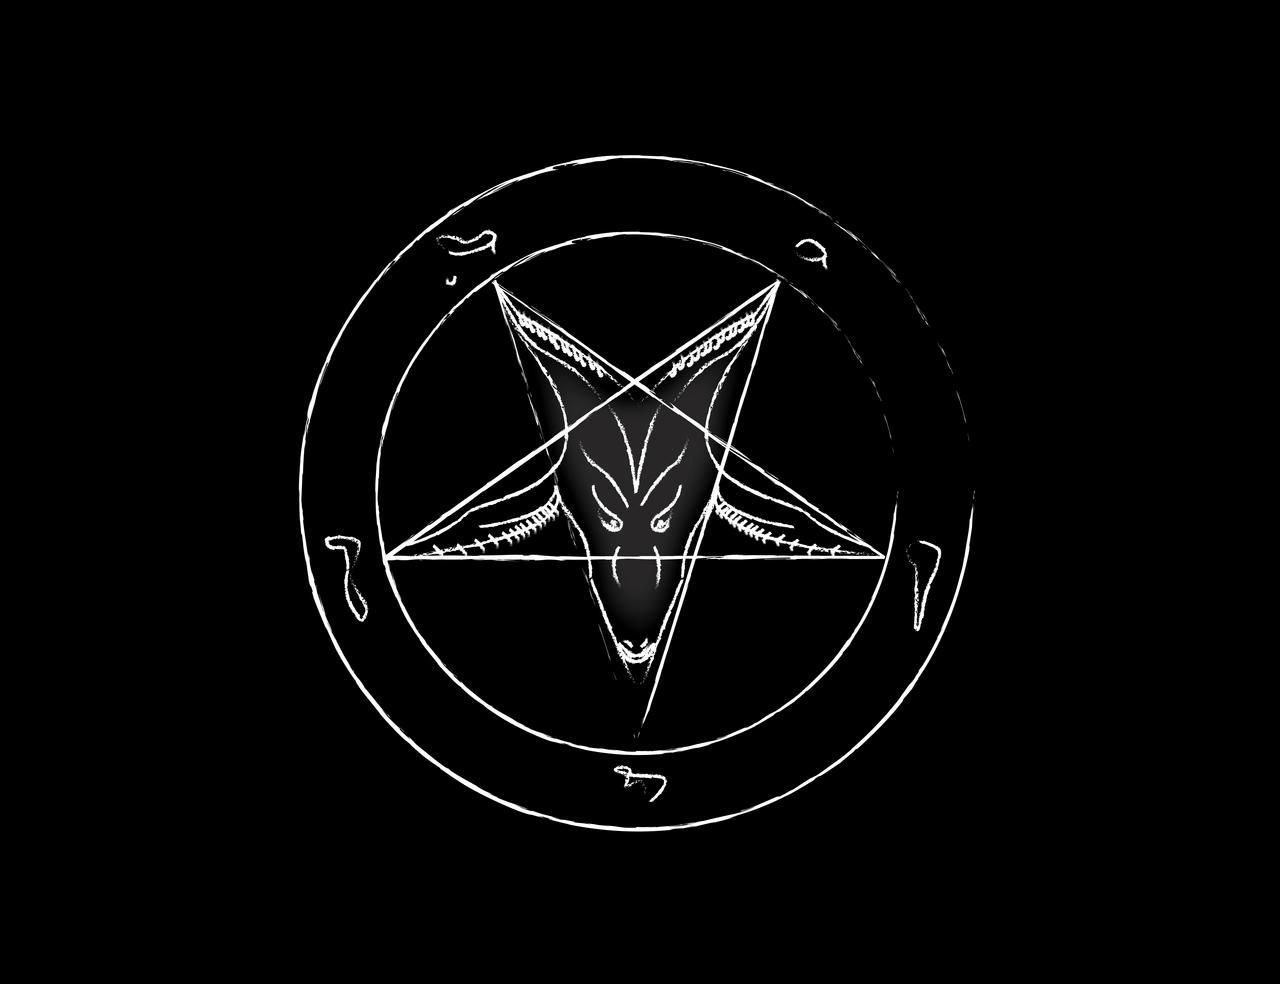 Sigil Of Satan Church Of Satan Asp Official Sigil Of Baphomet